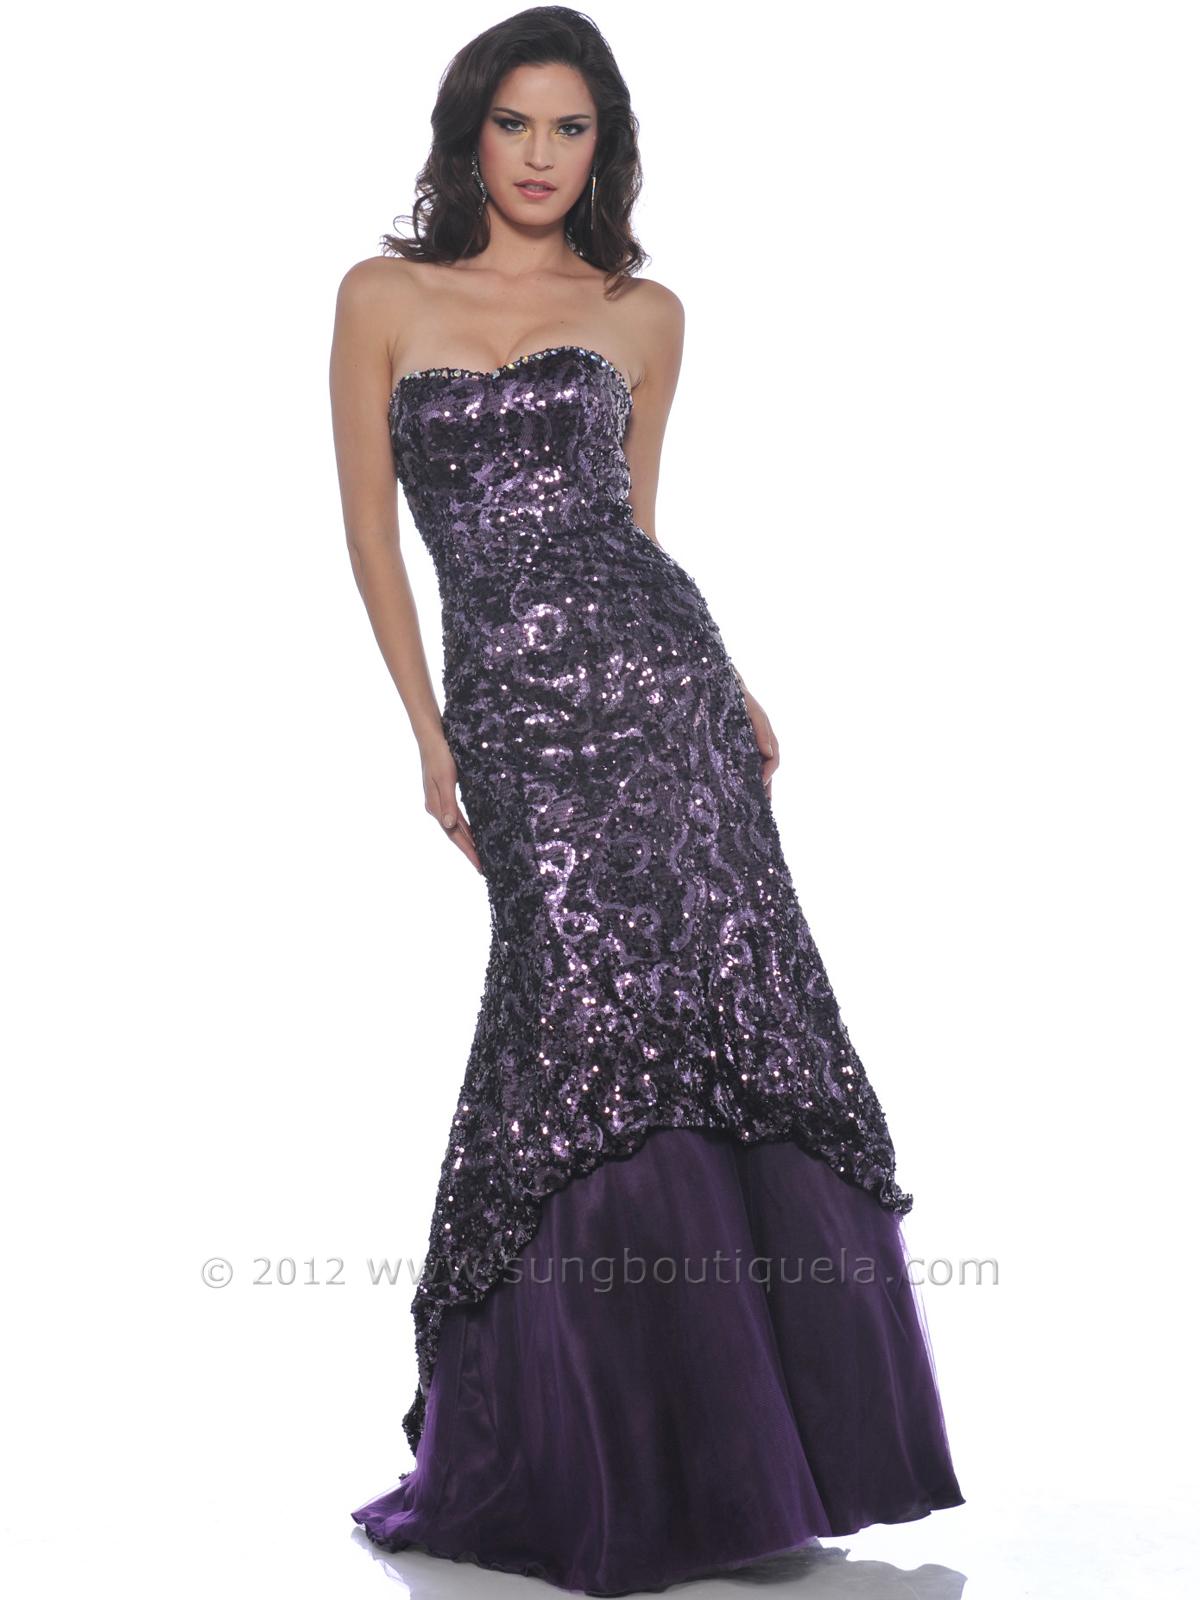 purple strapless mermaid prom dress